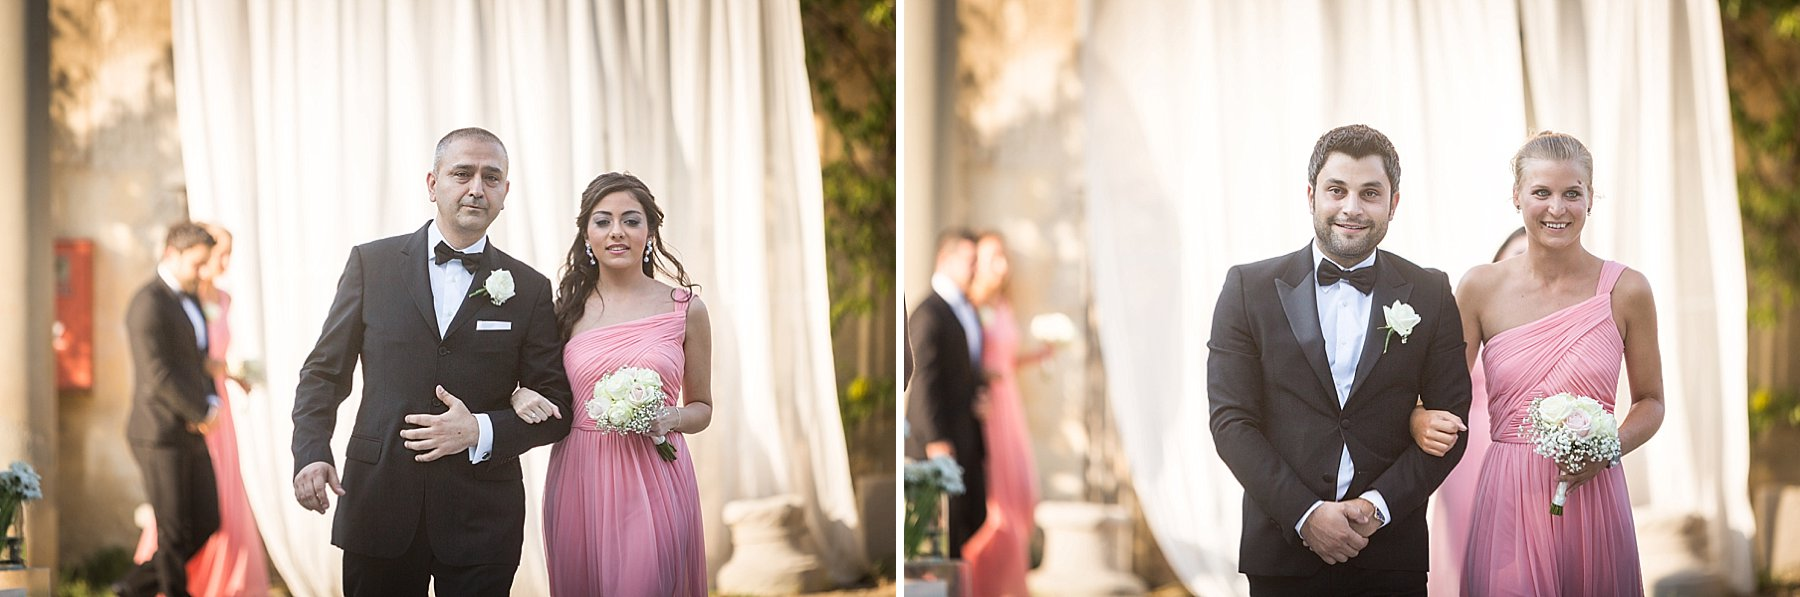 023-WeddingHanaJoseph